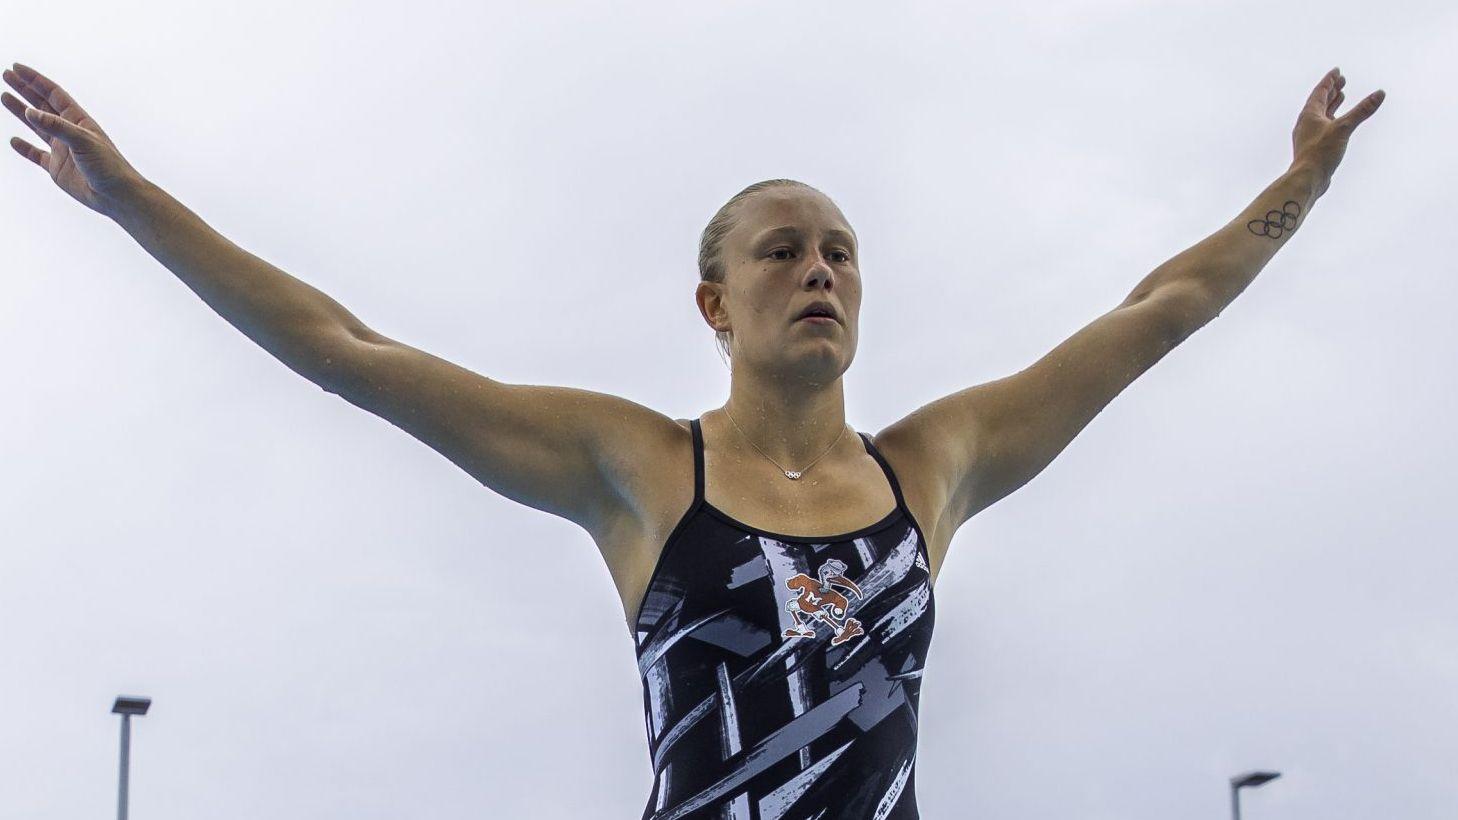 Gullstrand Returns Following Olympic Dream